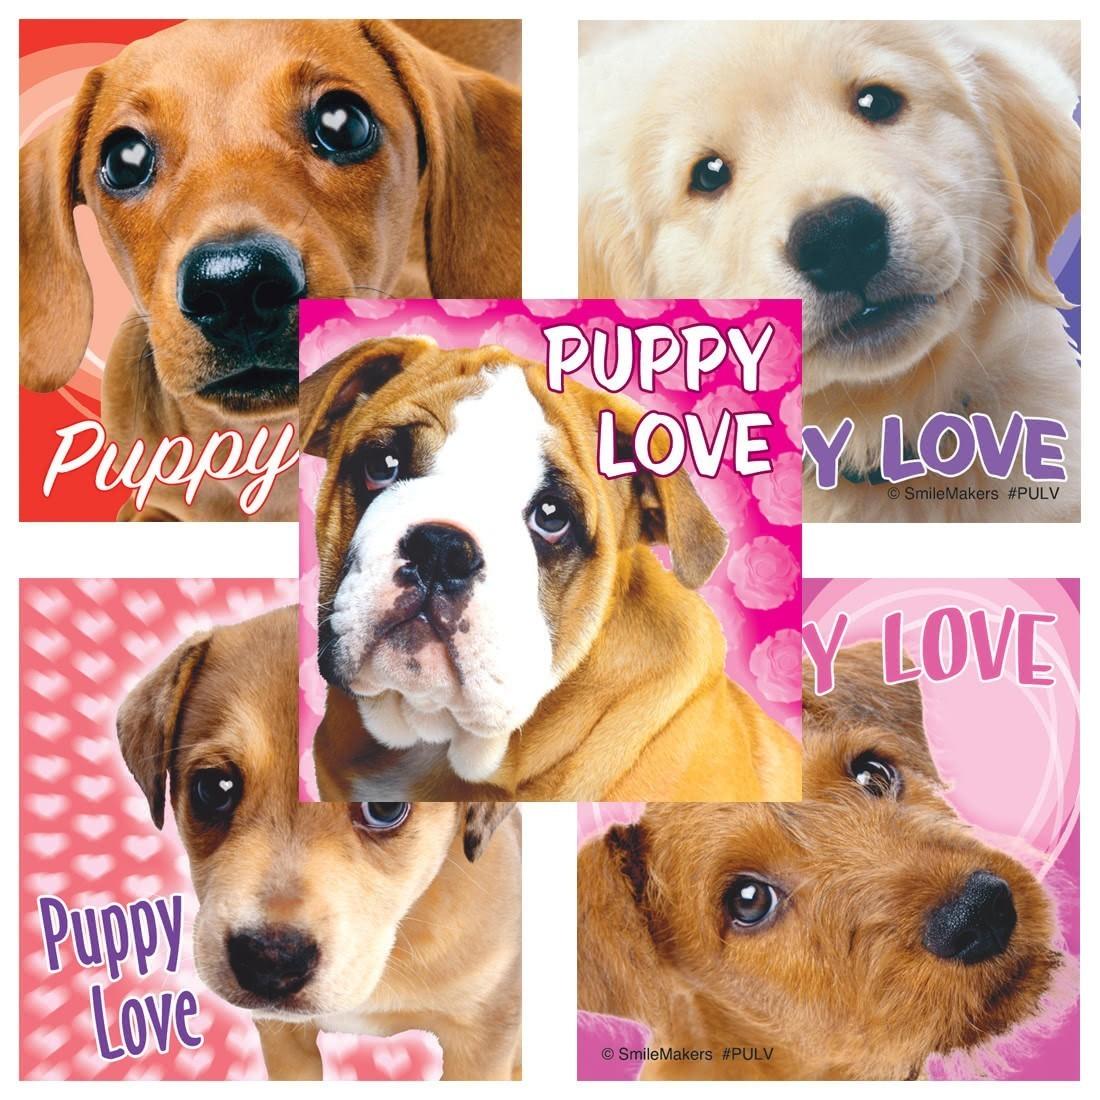 Puppy Love [image]